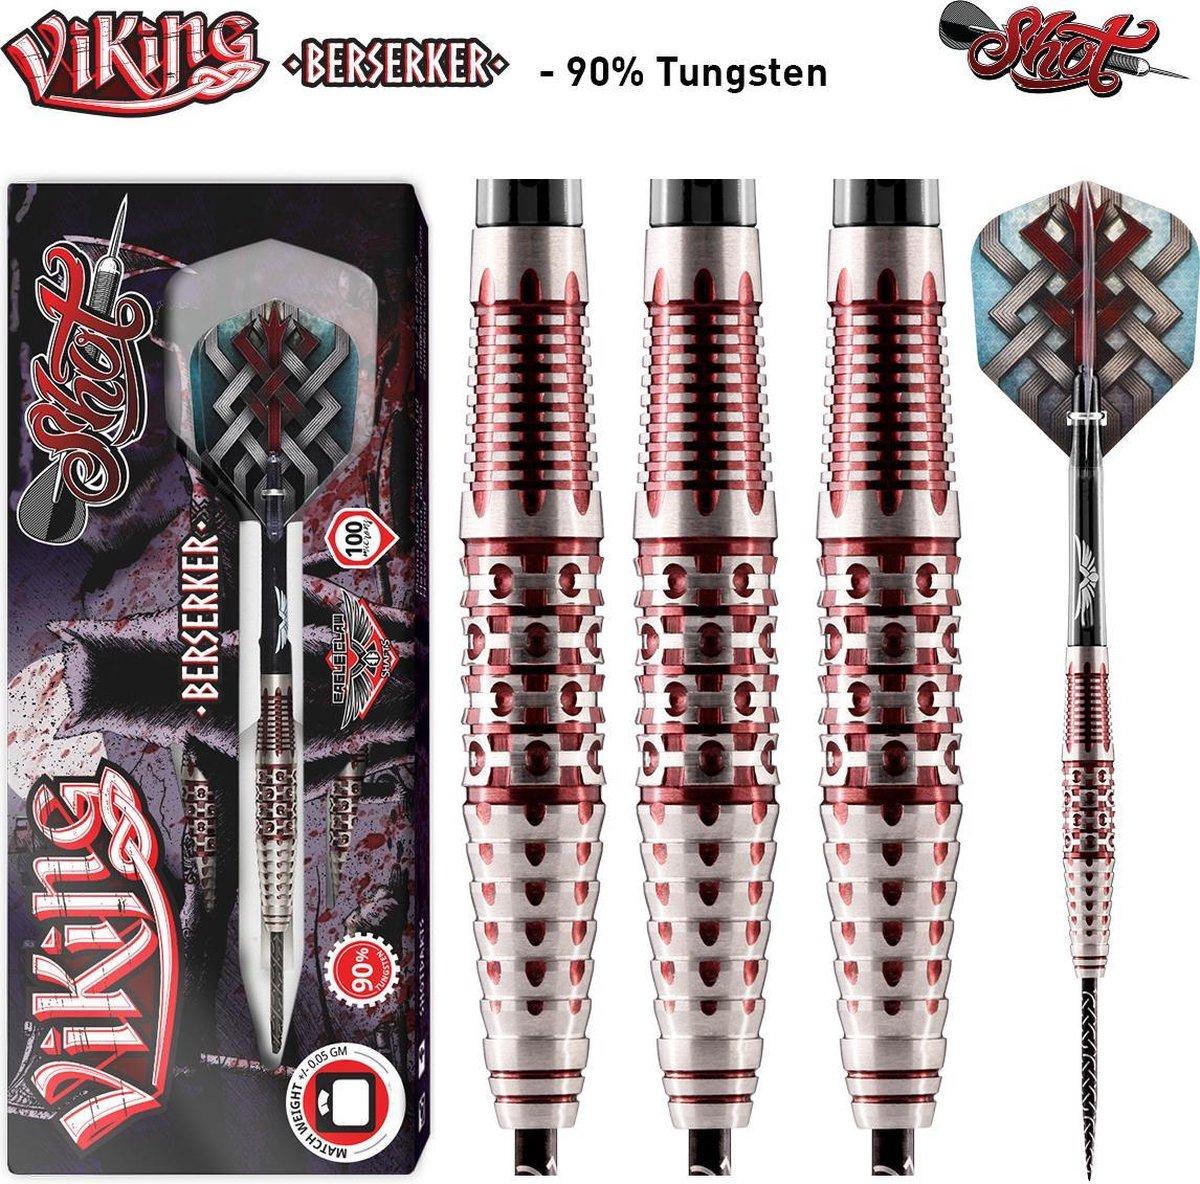 Shot! Viking Berserker 90% - 25 Gram